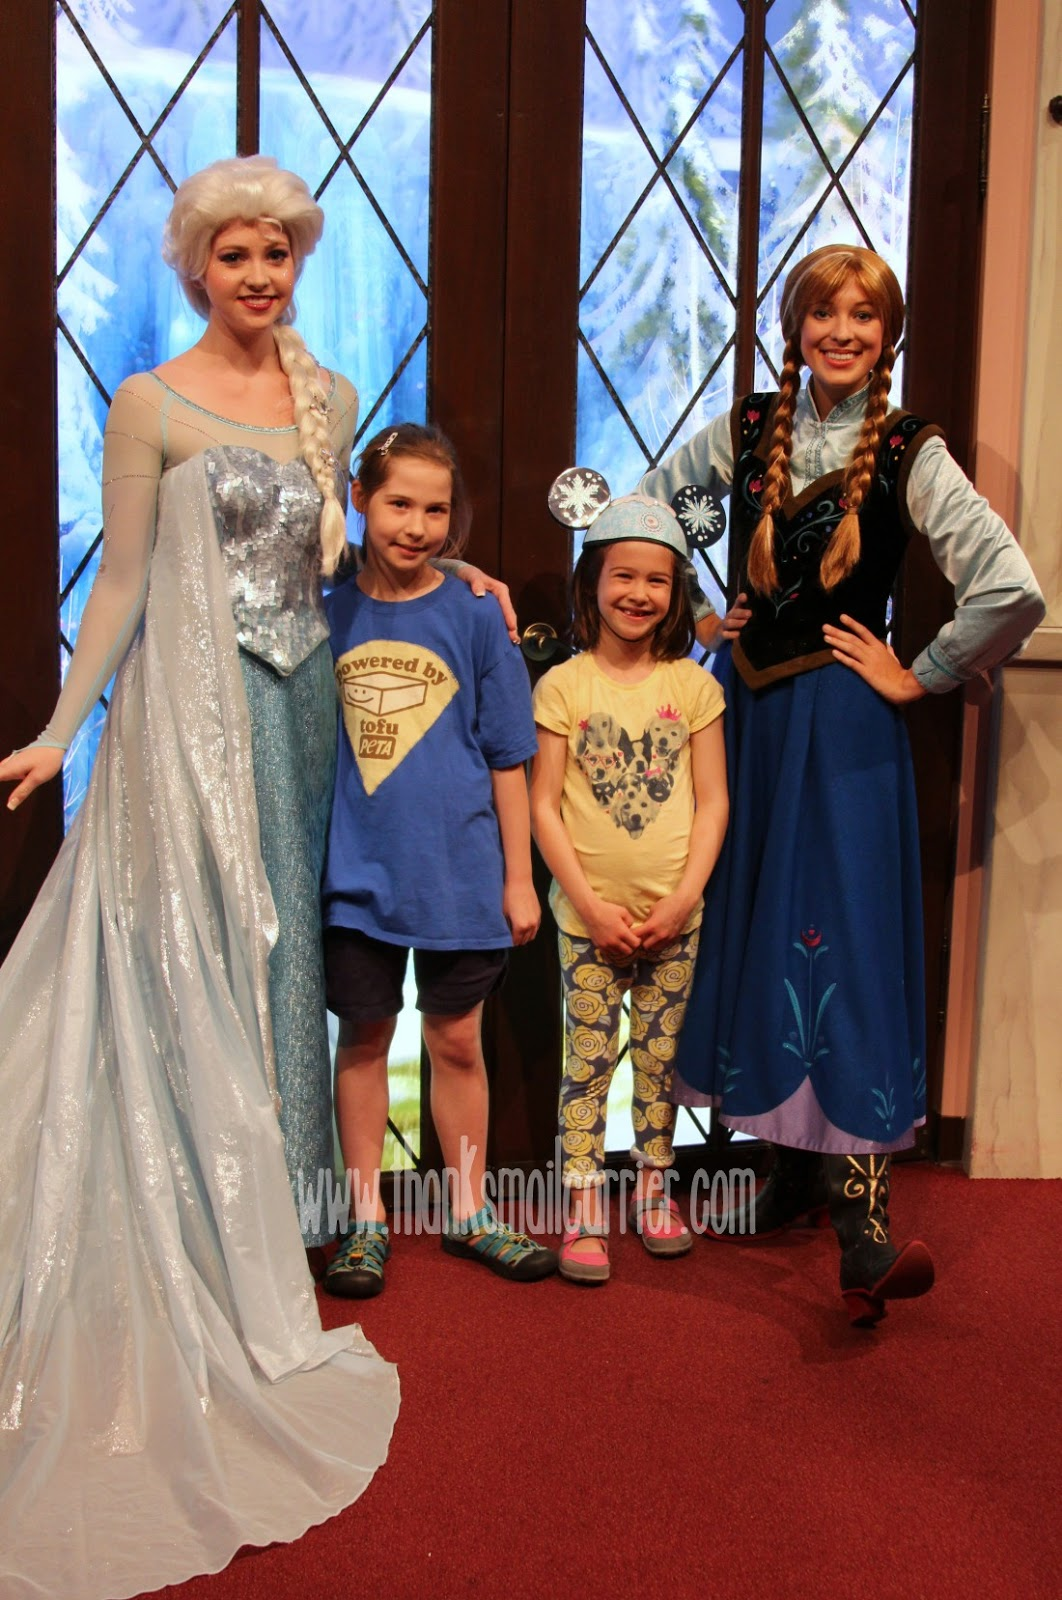 Disneyland Elsa and Anna